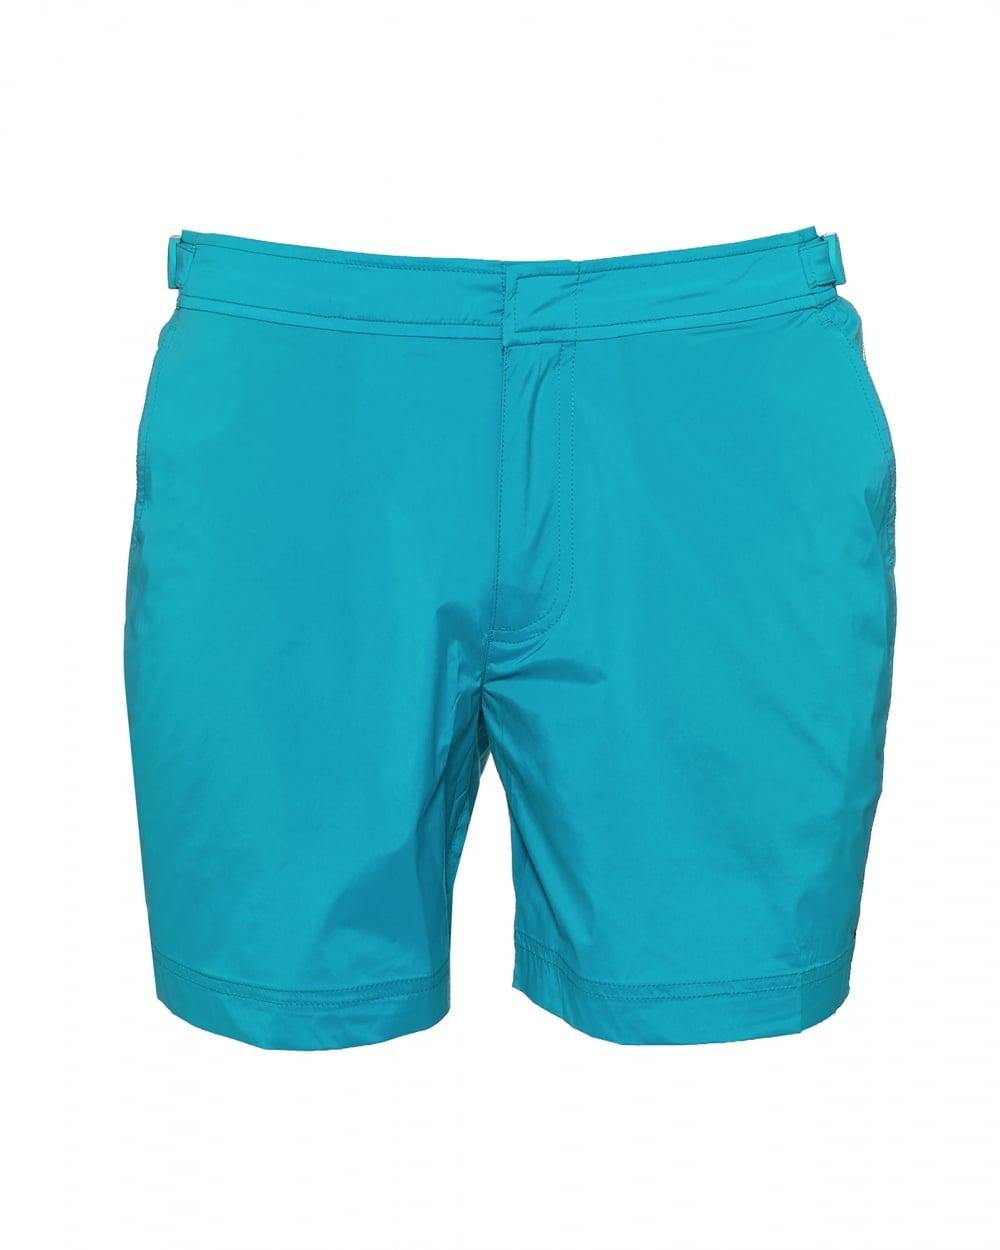 a715b6fc93 Orlebar Brown Mens Bulldog Sport Swim Shorts, Azure Blue ...